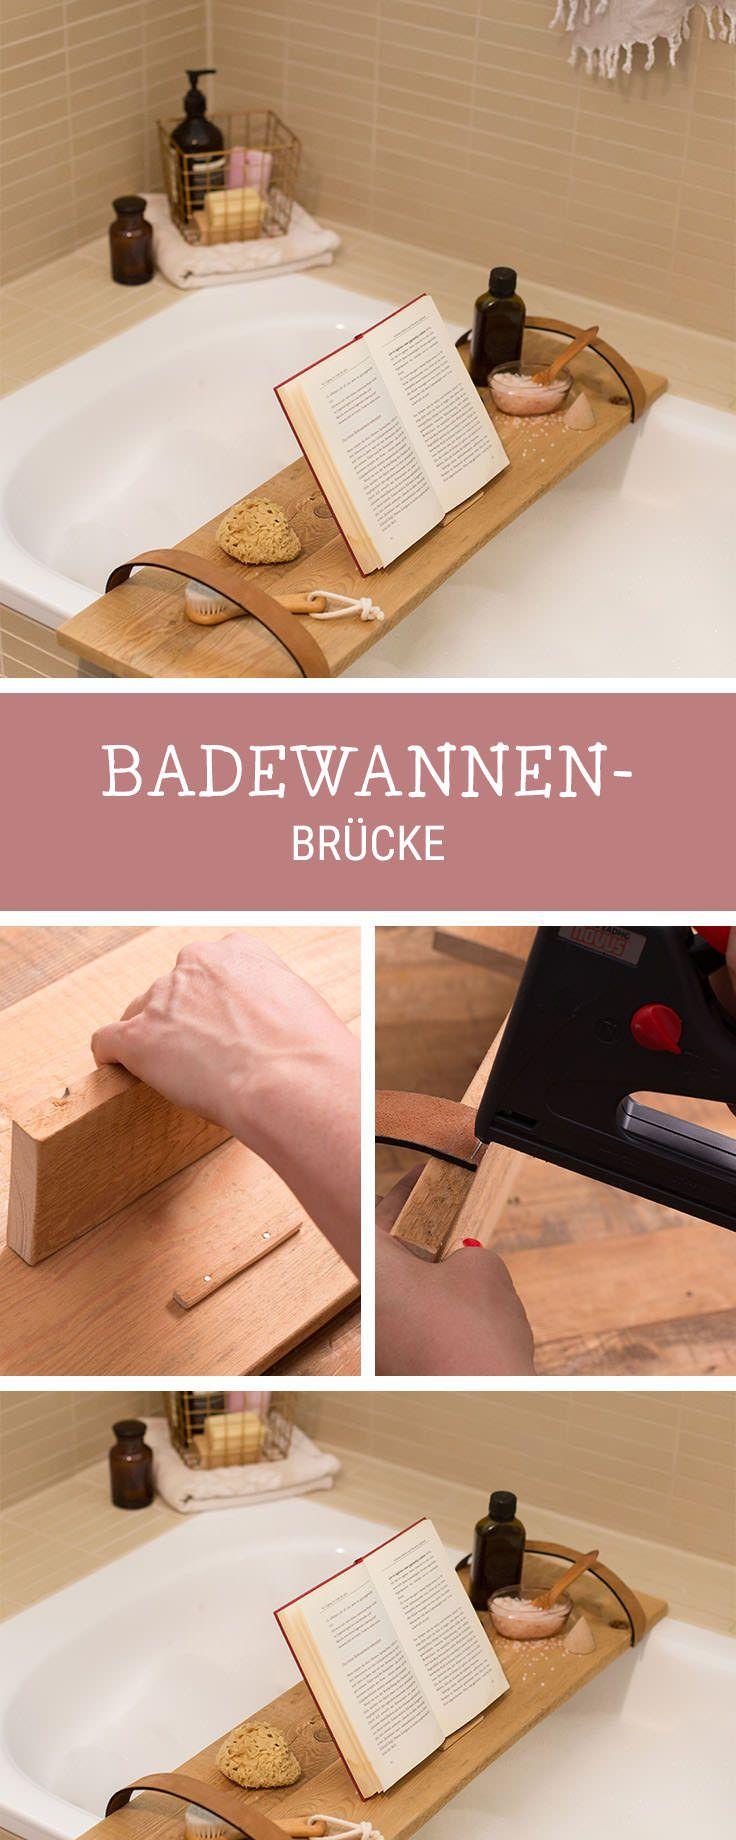 DIY Anleitung: Badewannenbrücke Aus Holz Selber Bauen Via DaWanda.com